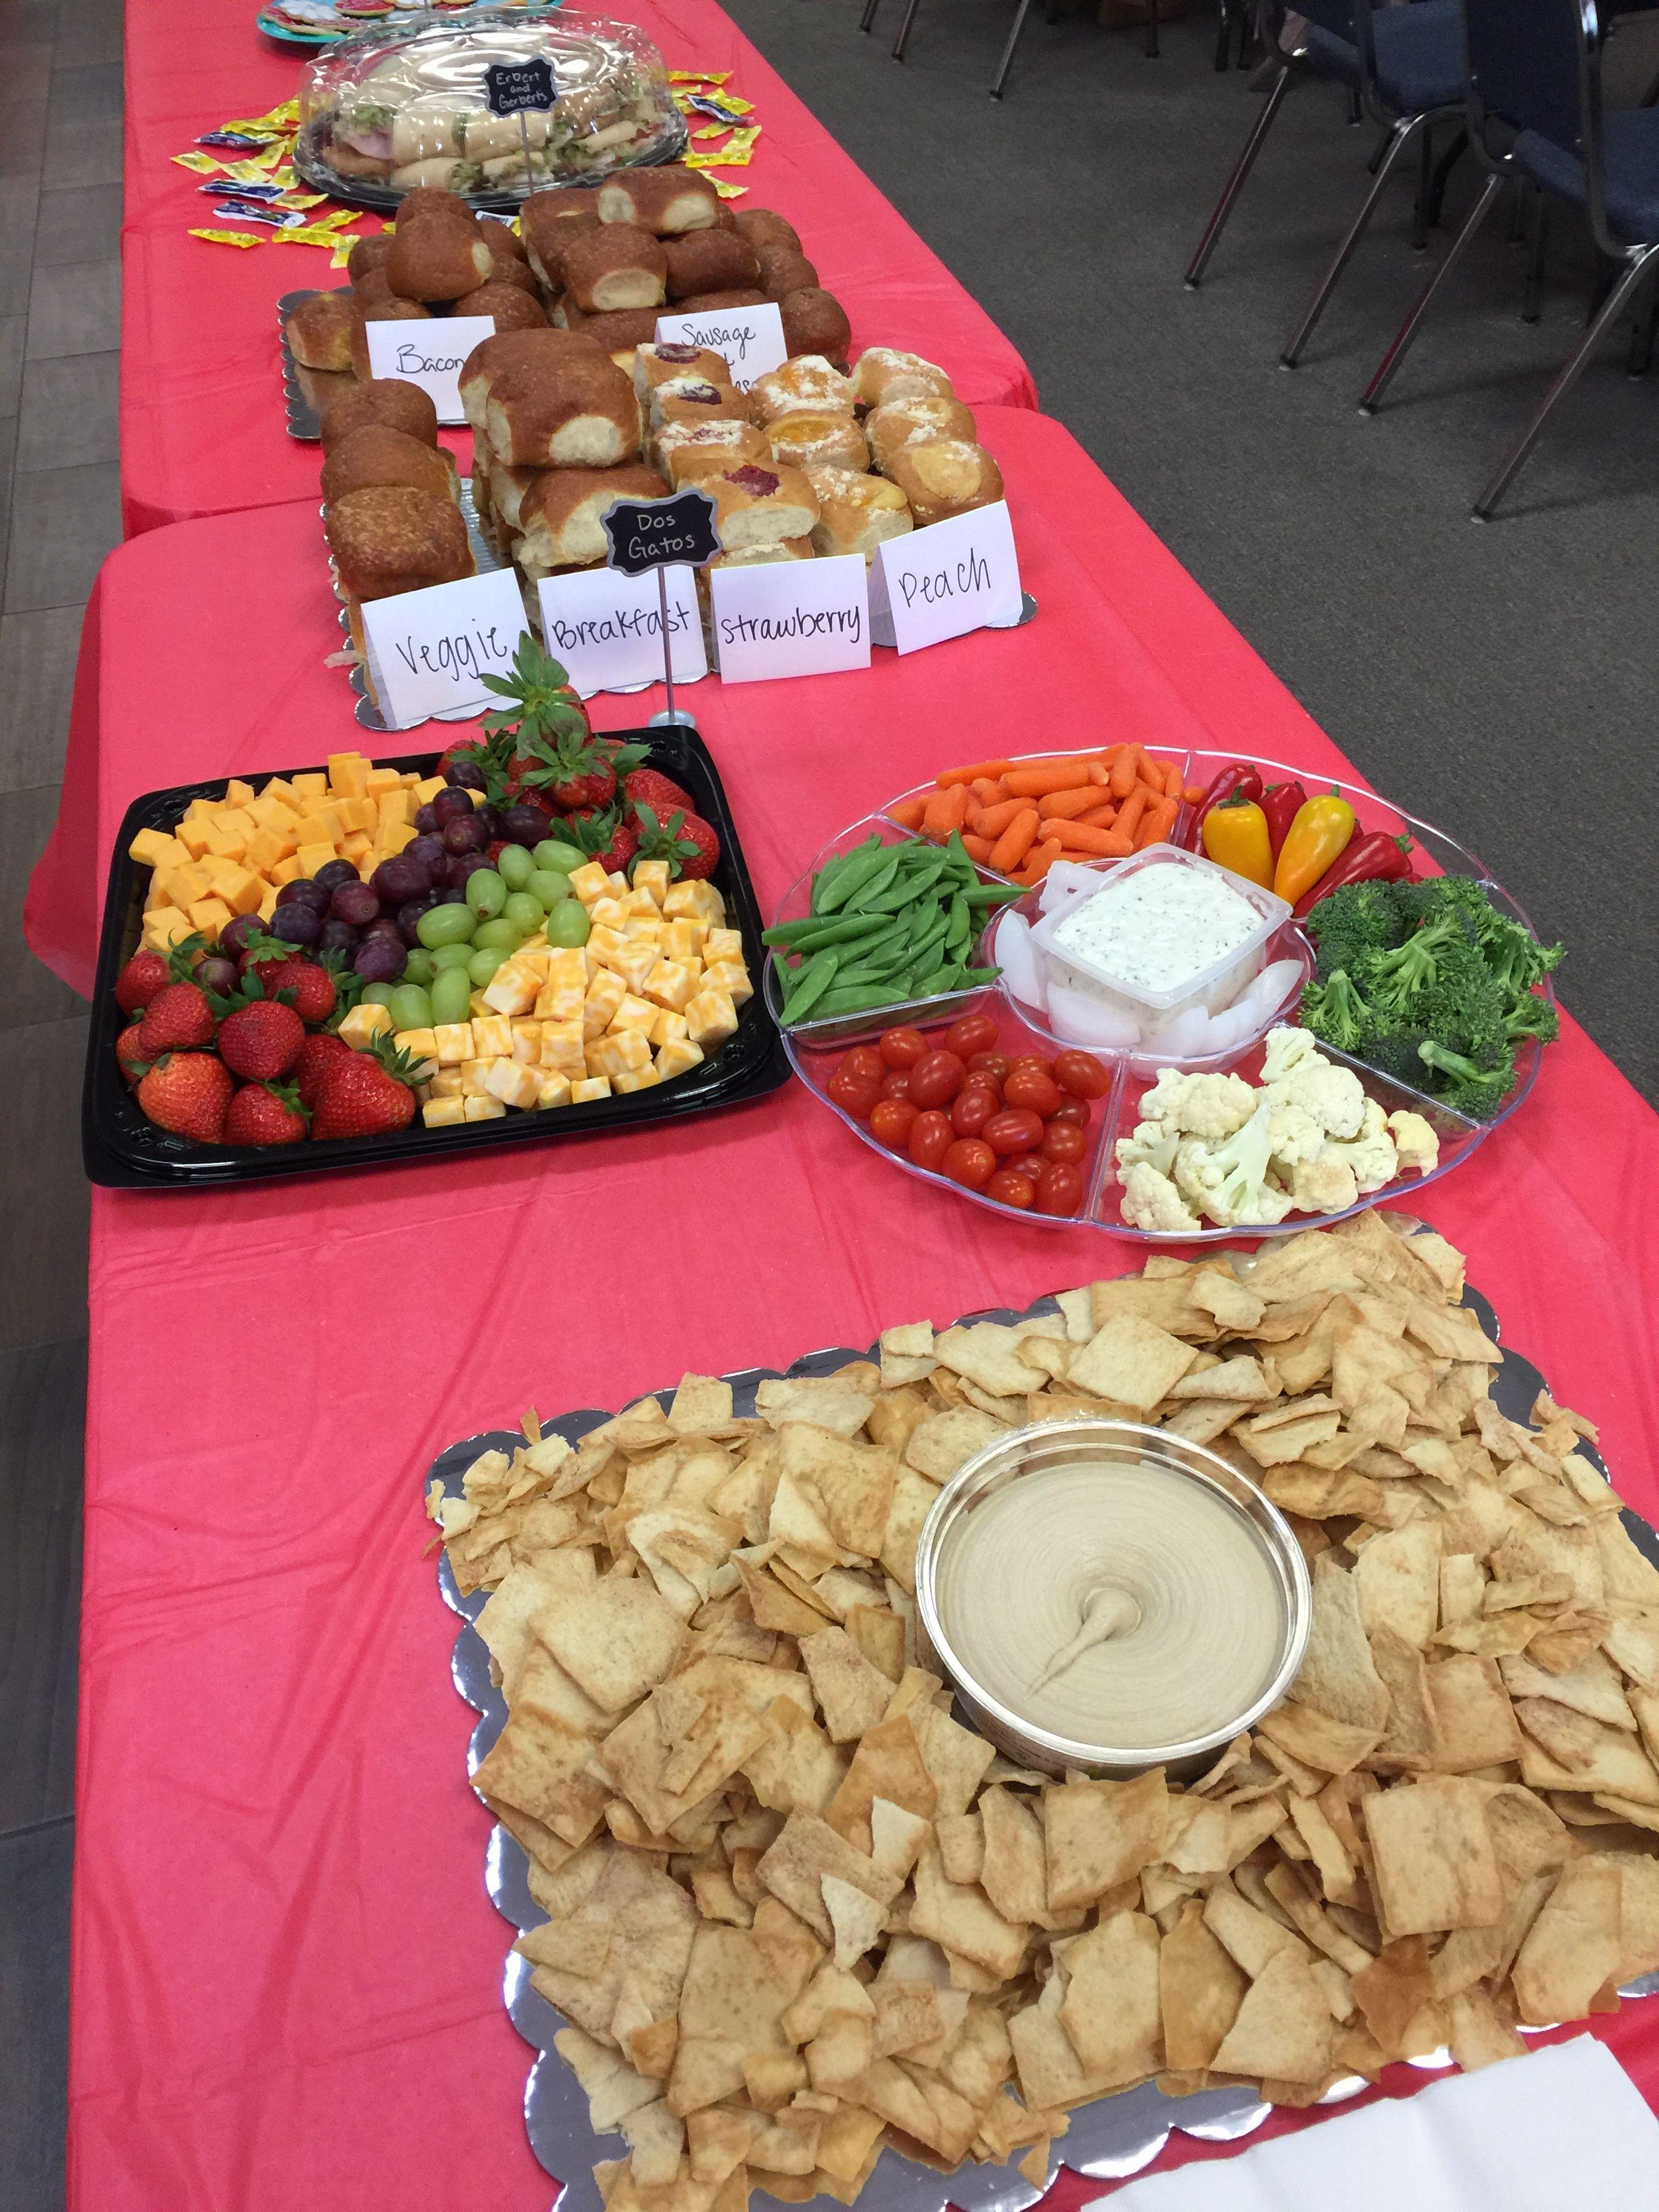 erberts and gerberts nutrition